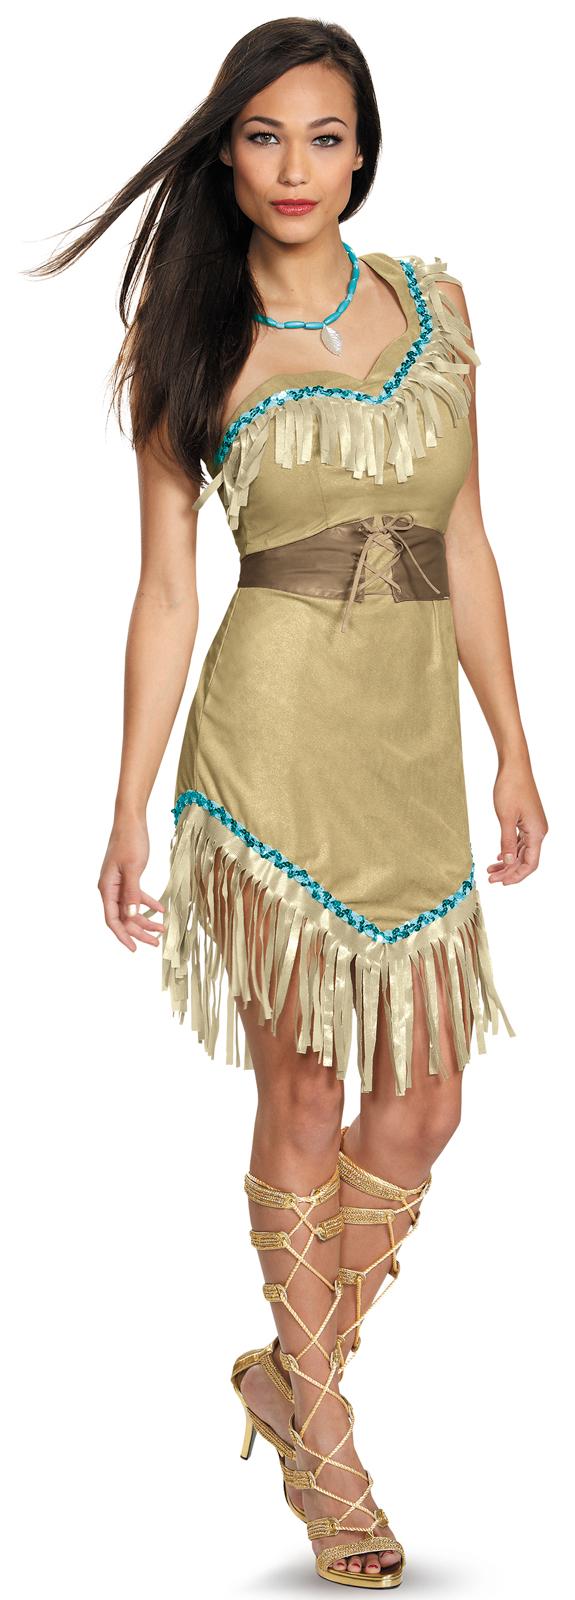 SaveEnlarge · 36 Best Pocahontas Costumes ...  sc 1 st  Meningrey & Pocahontas Child Costume - Meningrey